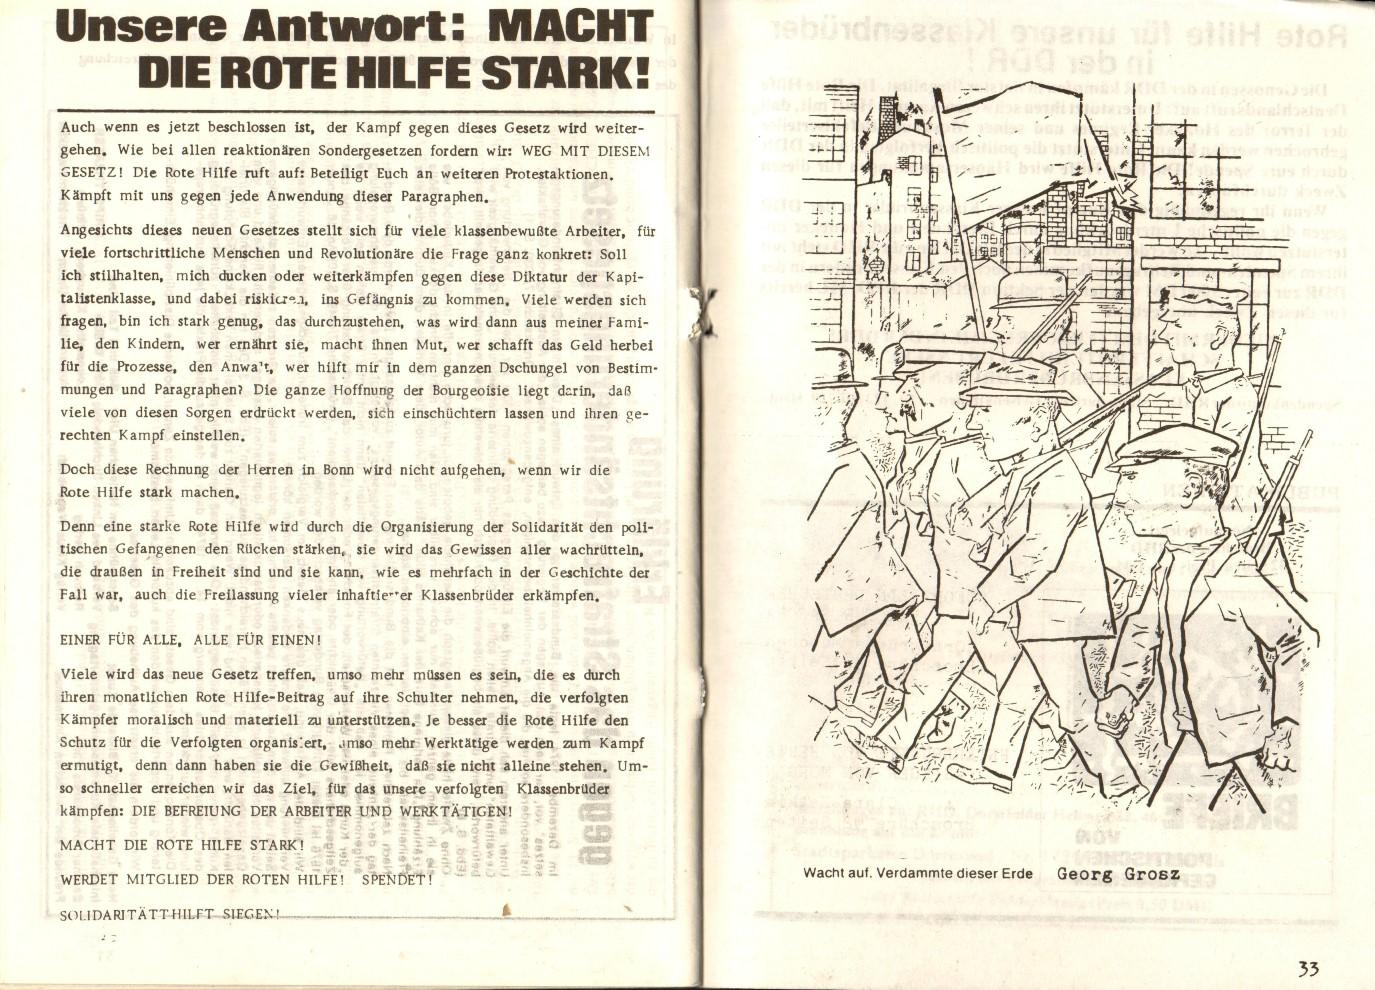 RHD_1976_Doku_Strafrechtsaenderungsgesetz_17